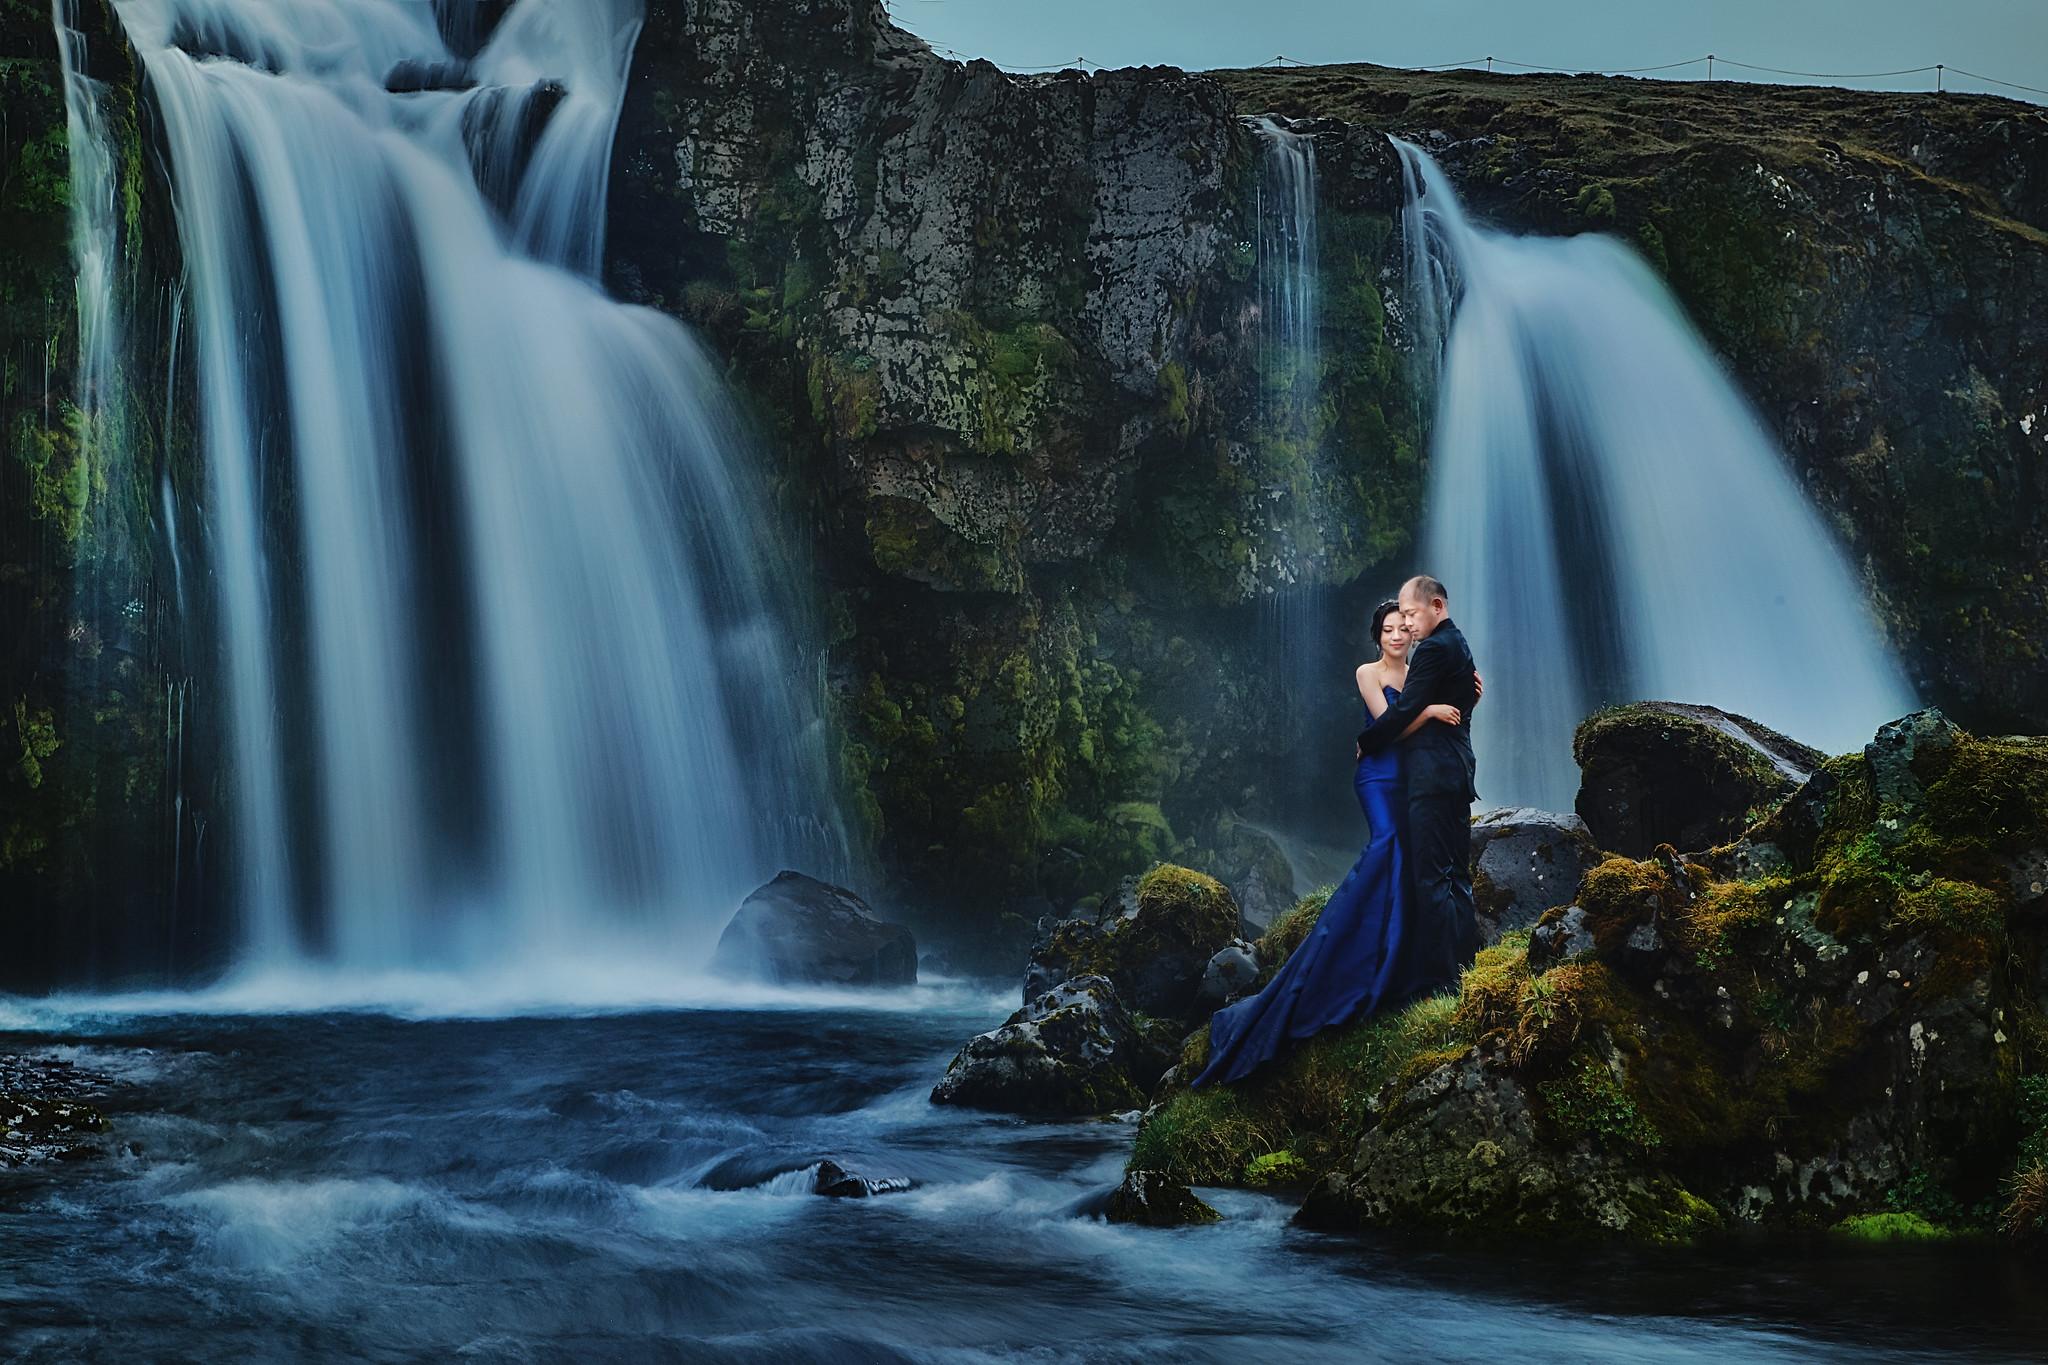 World Tour, Oversea, 海外婚紗, 旅行婚紗, Donfer, Fine Art, 海外計劃, 海外婚禮, 歐洲婚紗, 冰島婚紗, Iceland Pre-Wedding, 藝術婚紗